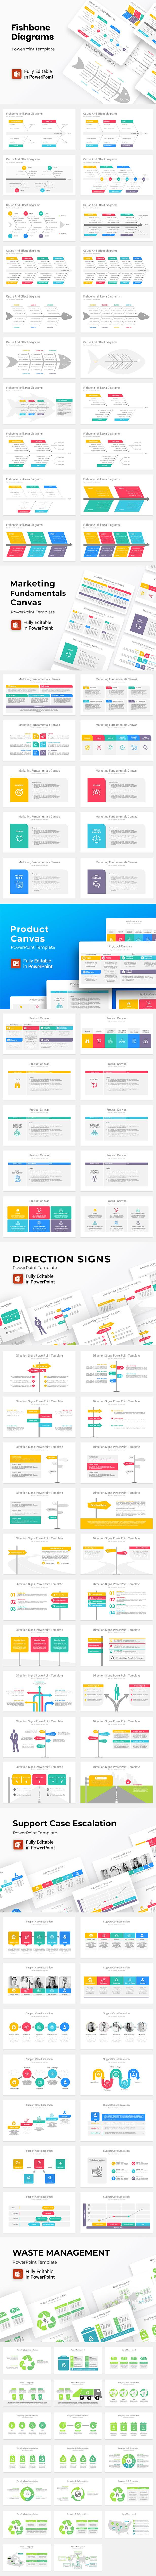 Slide Deck - Multipurpose PowerPoint Template - 10